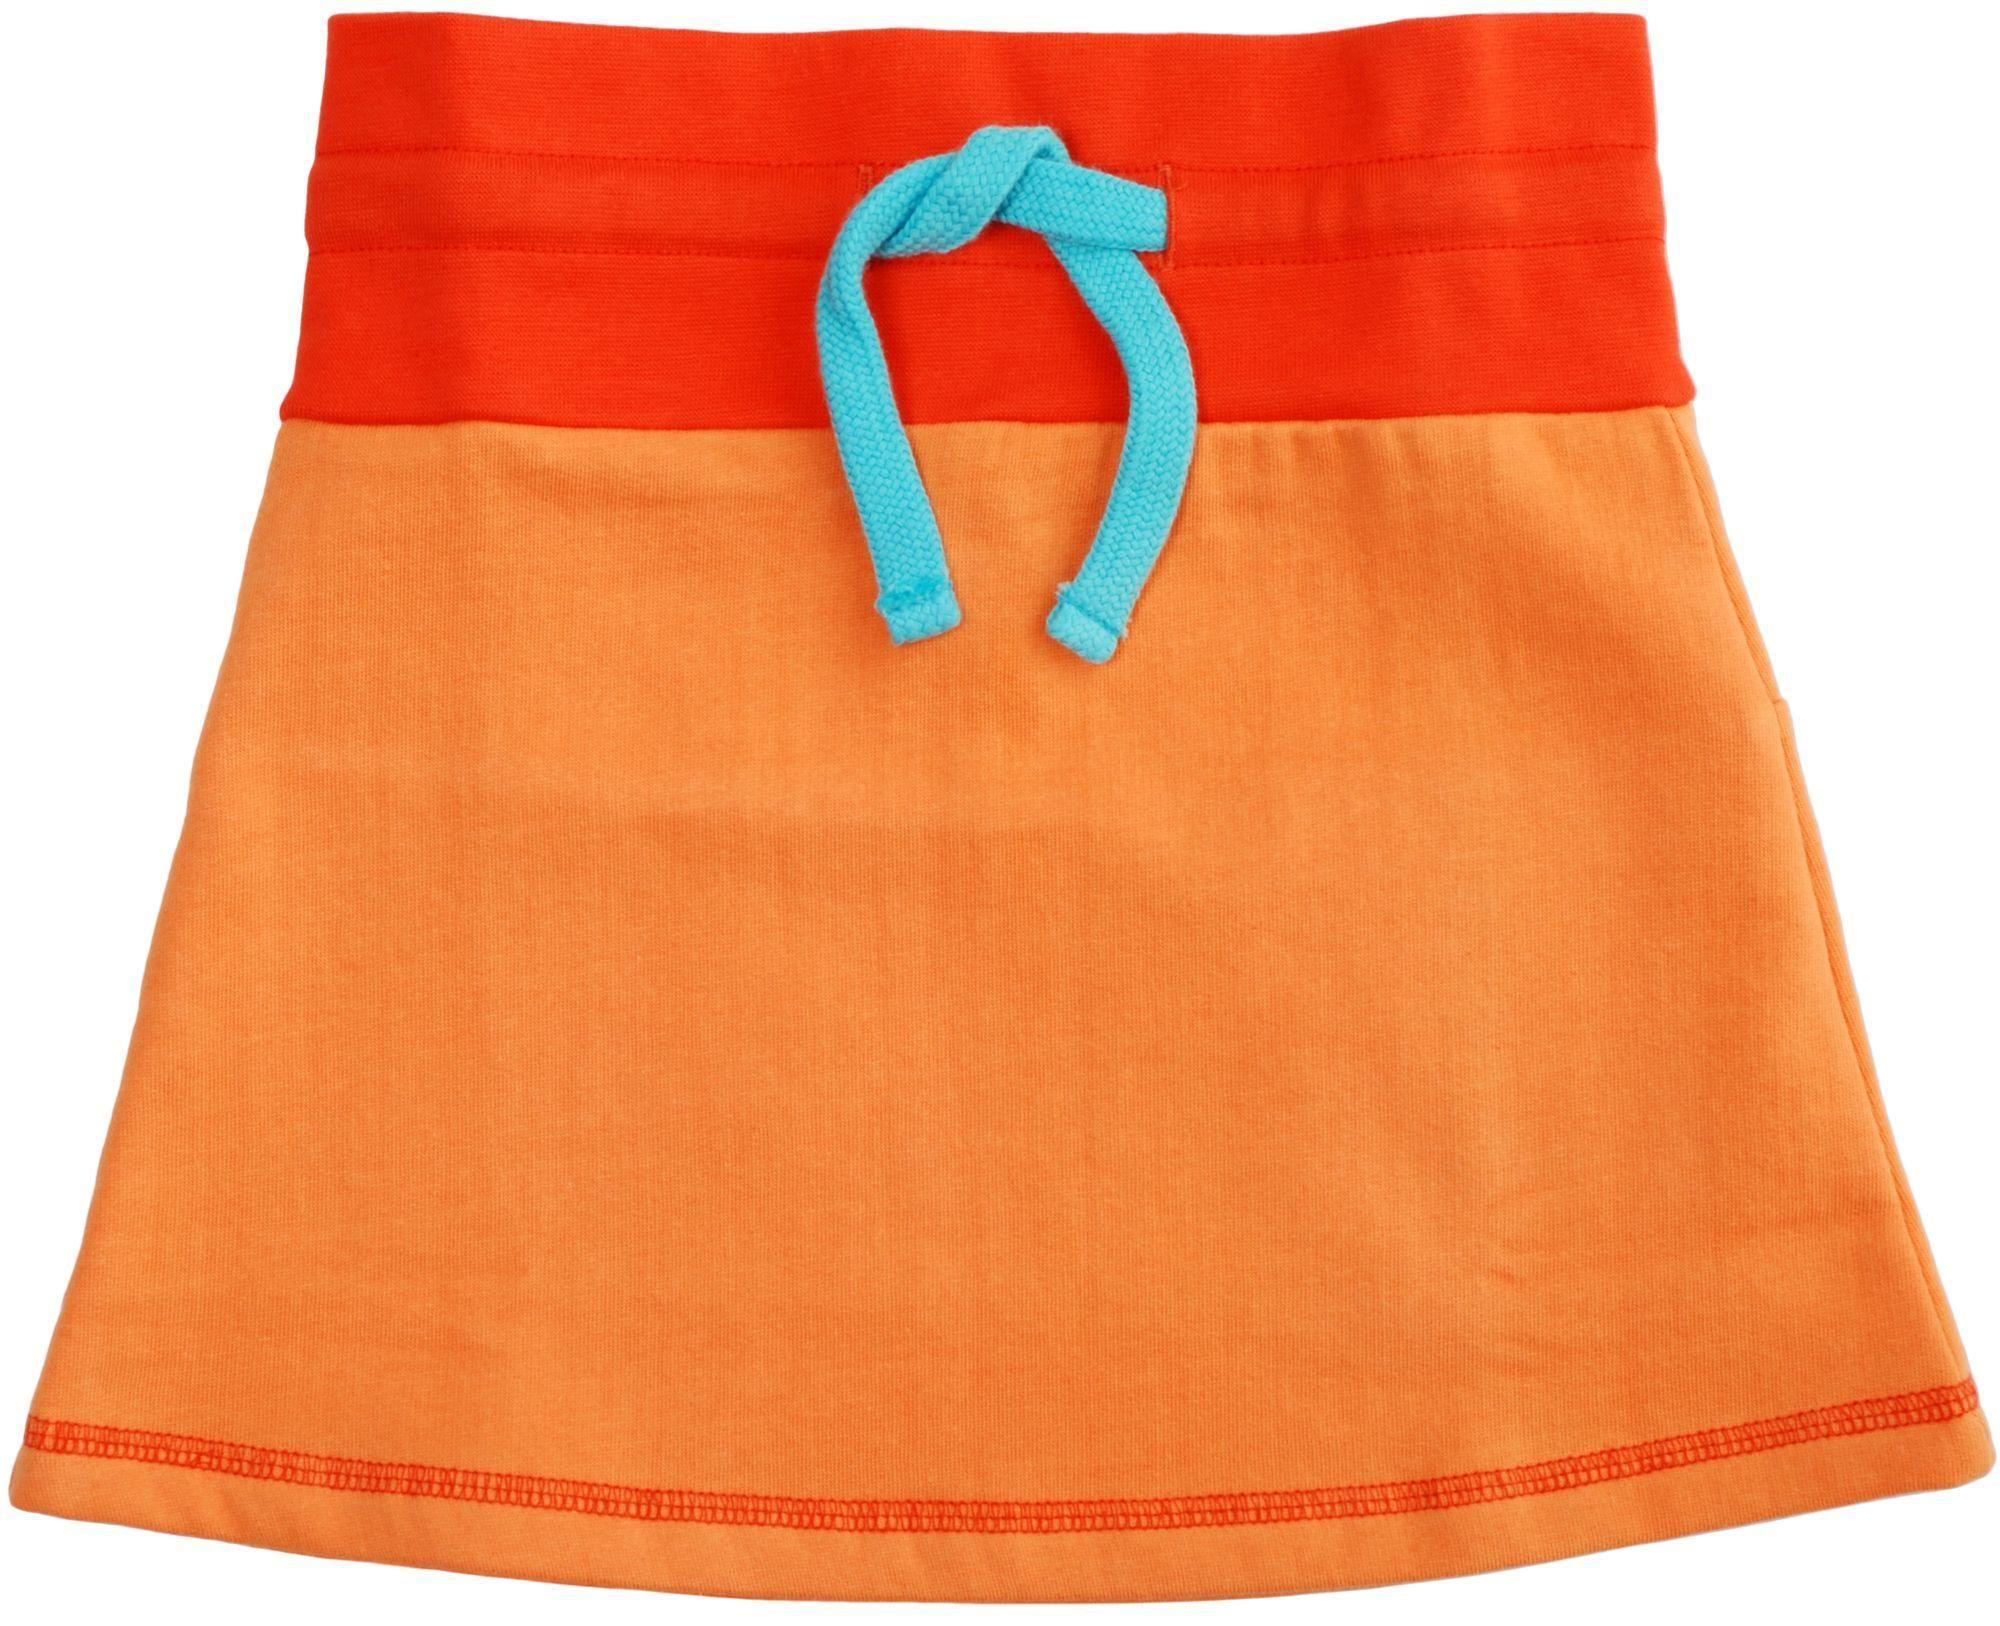 Duns Cotton skirt - Orange/red Retro Baby Clothes - Baby Boy clothes - Danish Baby Clothes - Smafolk - Toddler clothing - Baby Clothing - Baby clothes Online